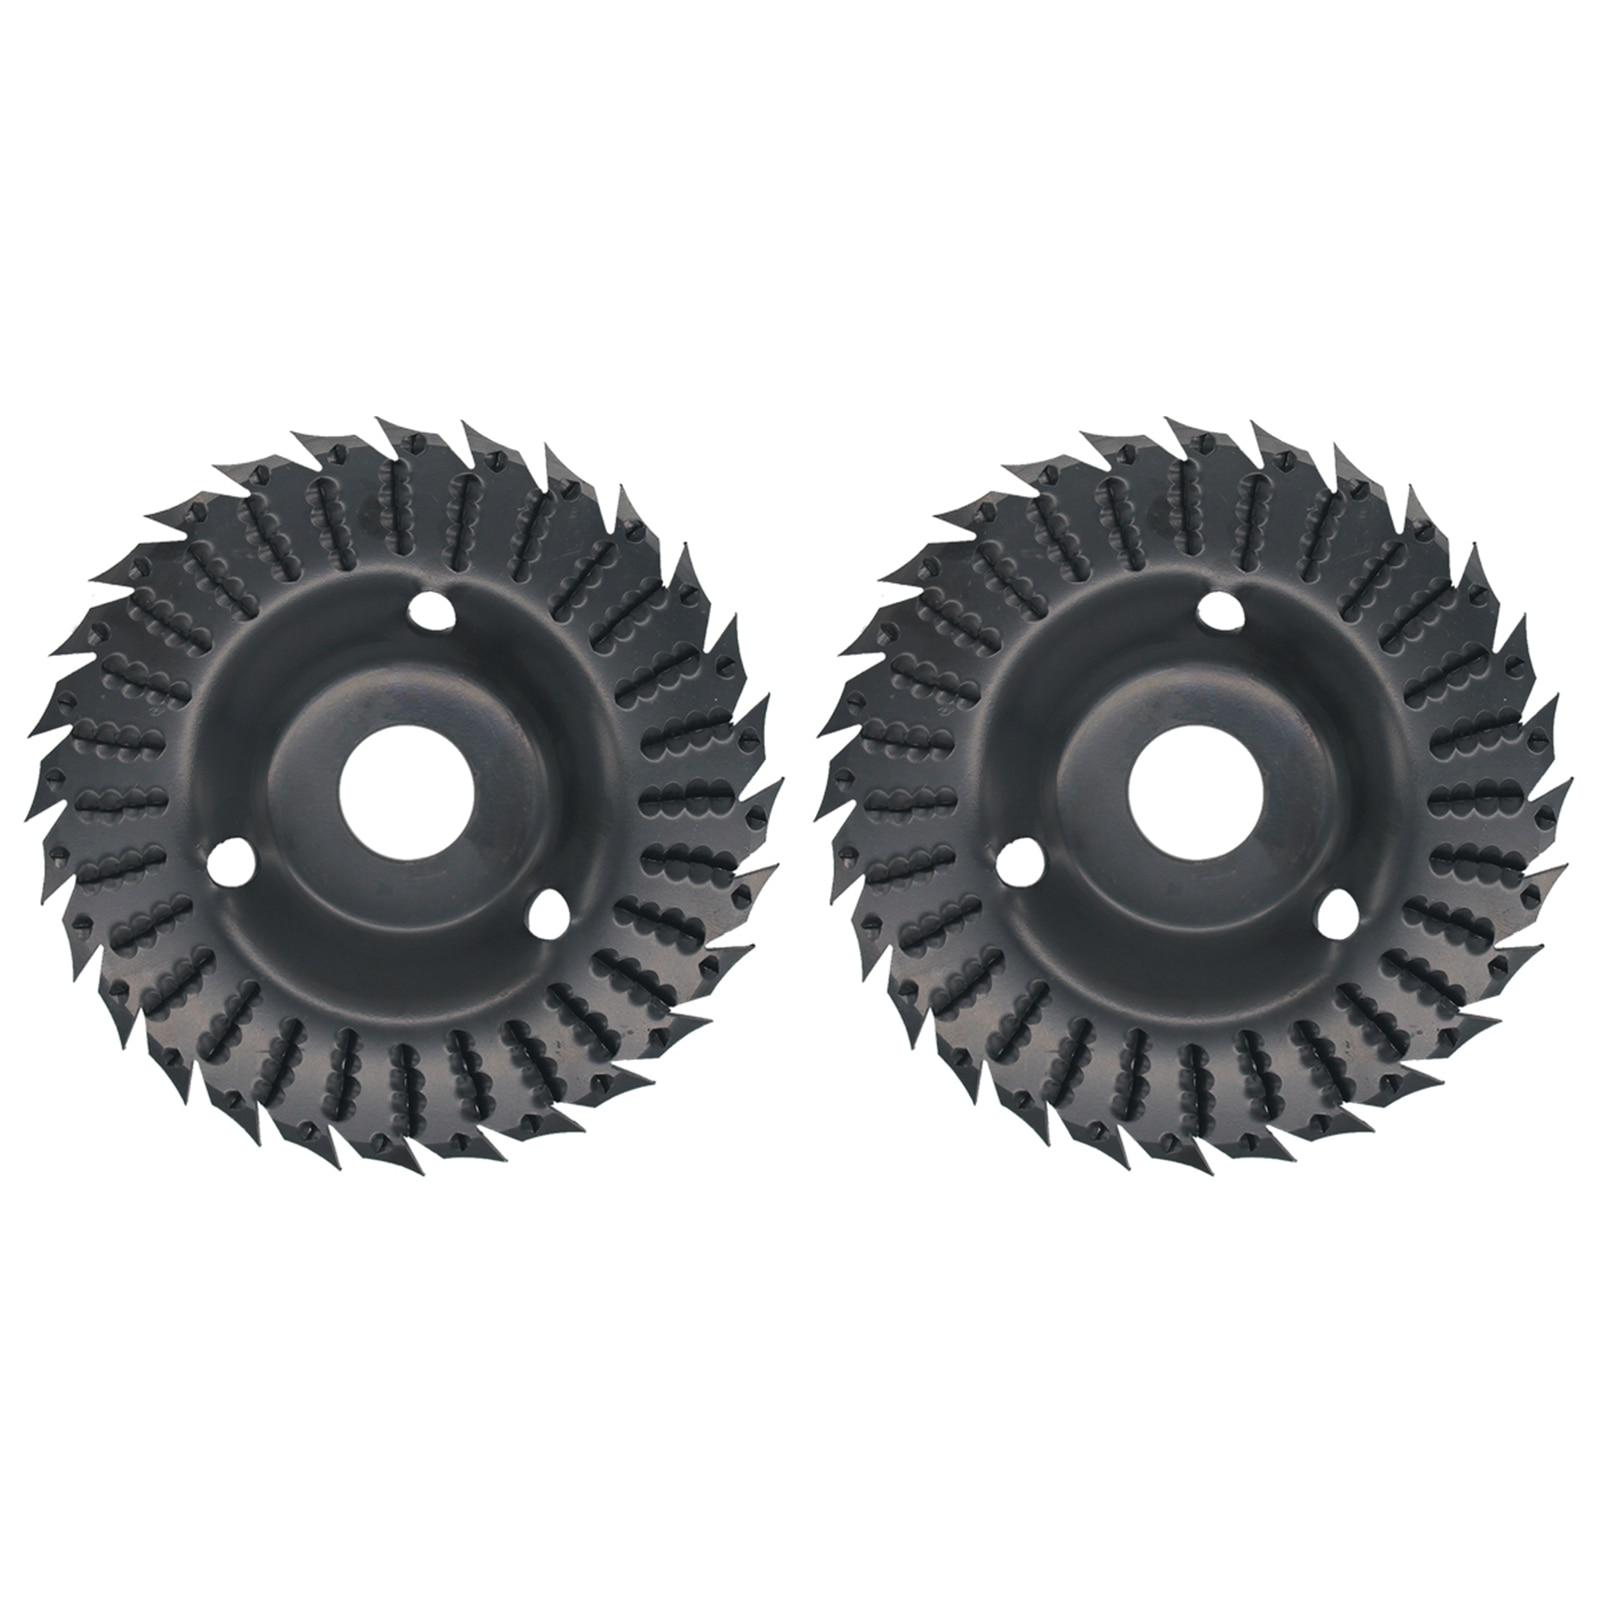 KKmoon Angle Grinder Grinding Disc 28 Teeth Wood Grinding Wheel Abrasive Disc Woodworking Wood Shaping Disc 1pcs/2pcs